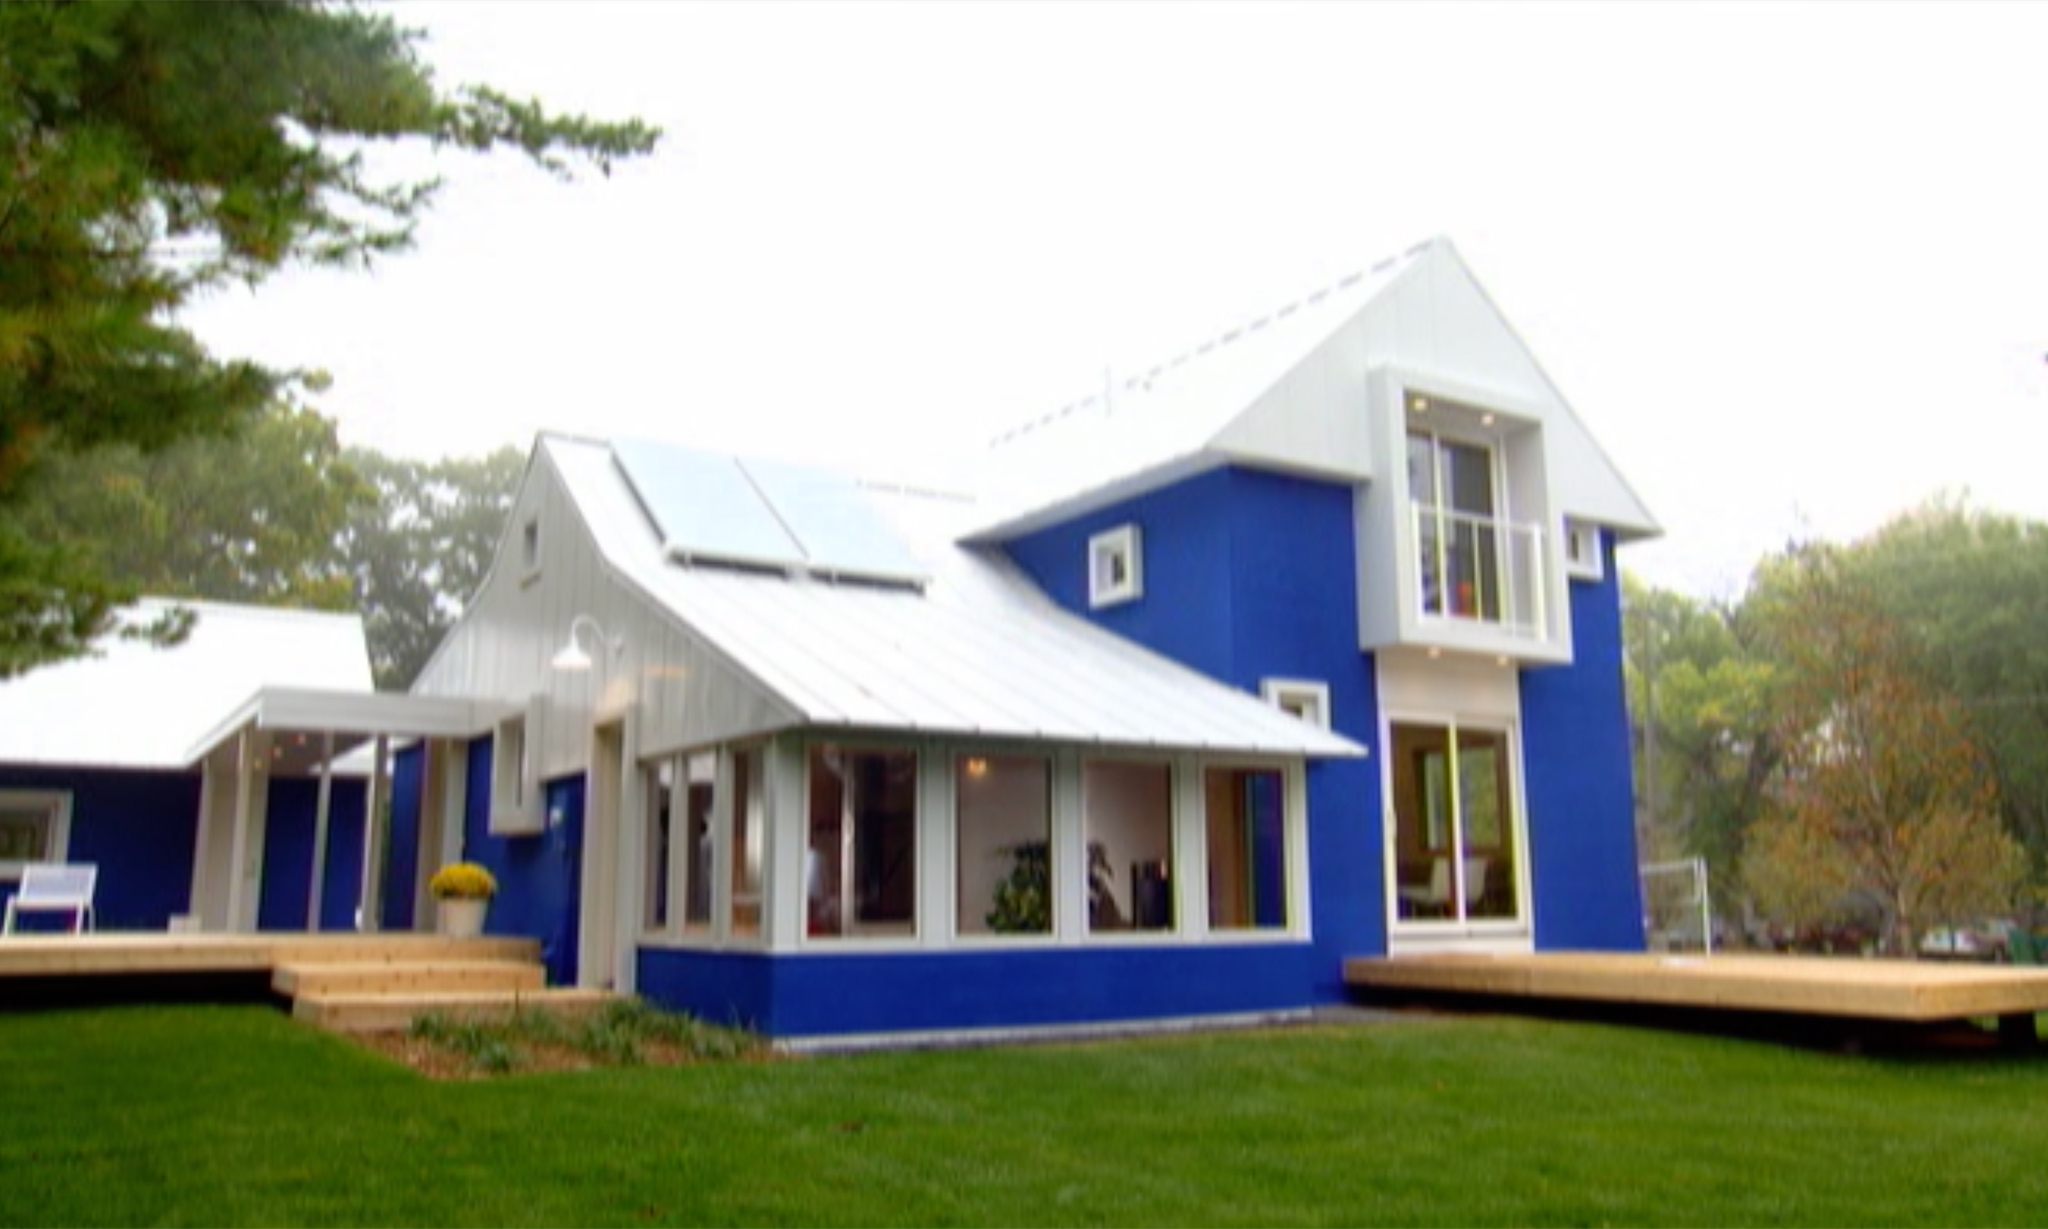 little blue house -